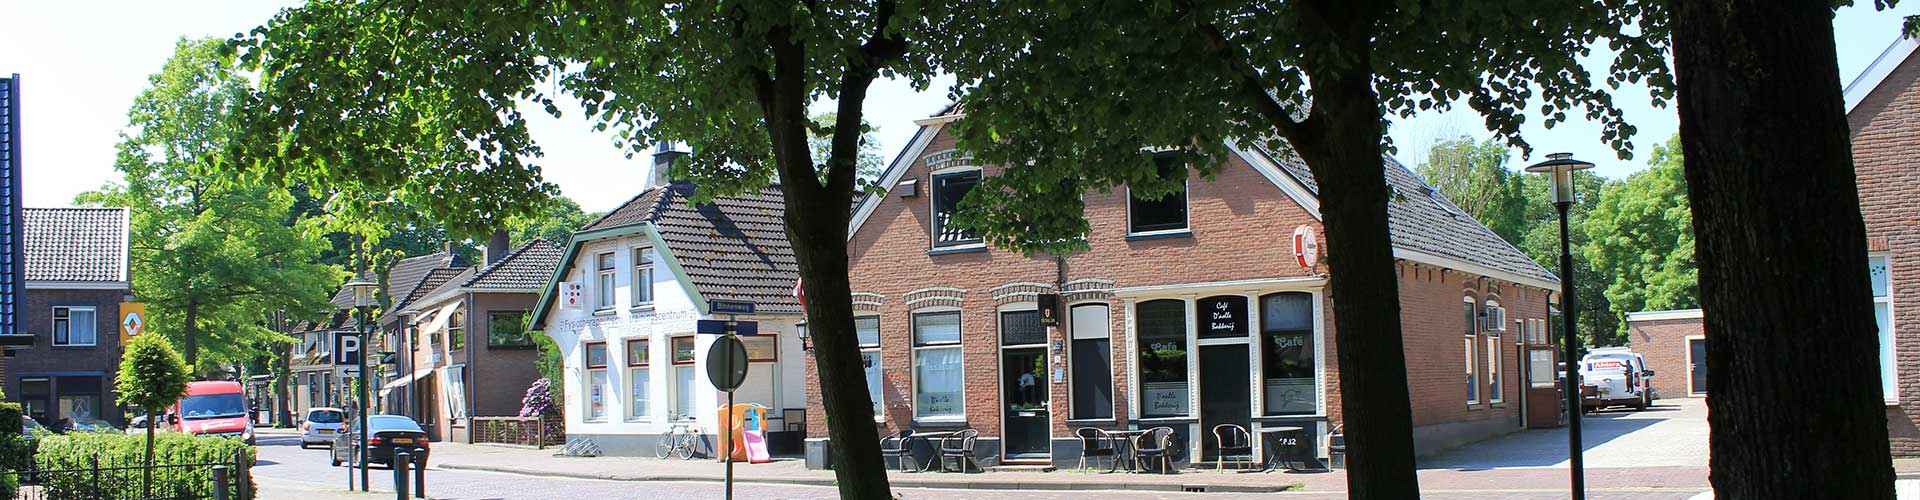 Bruin Cafe D' Aolle Bakkerij